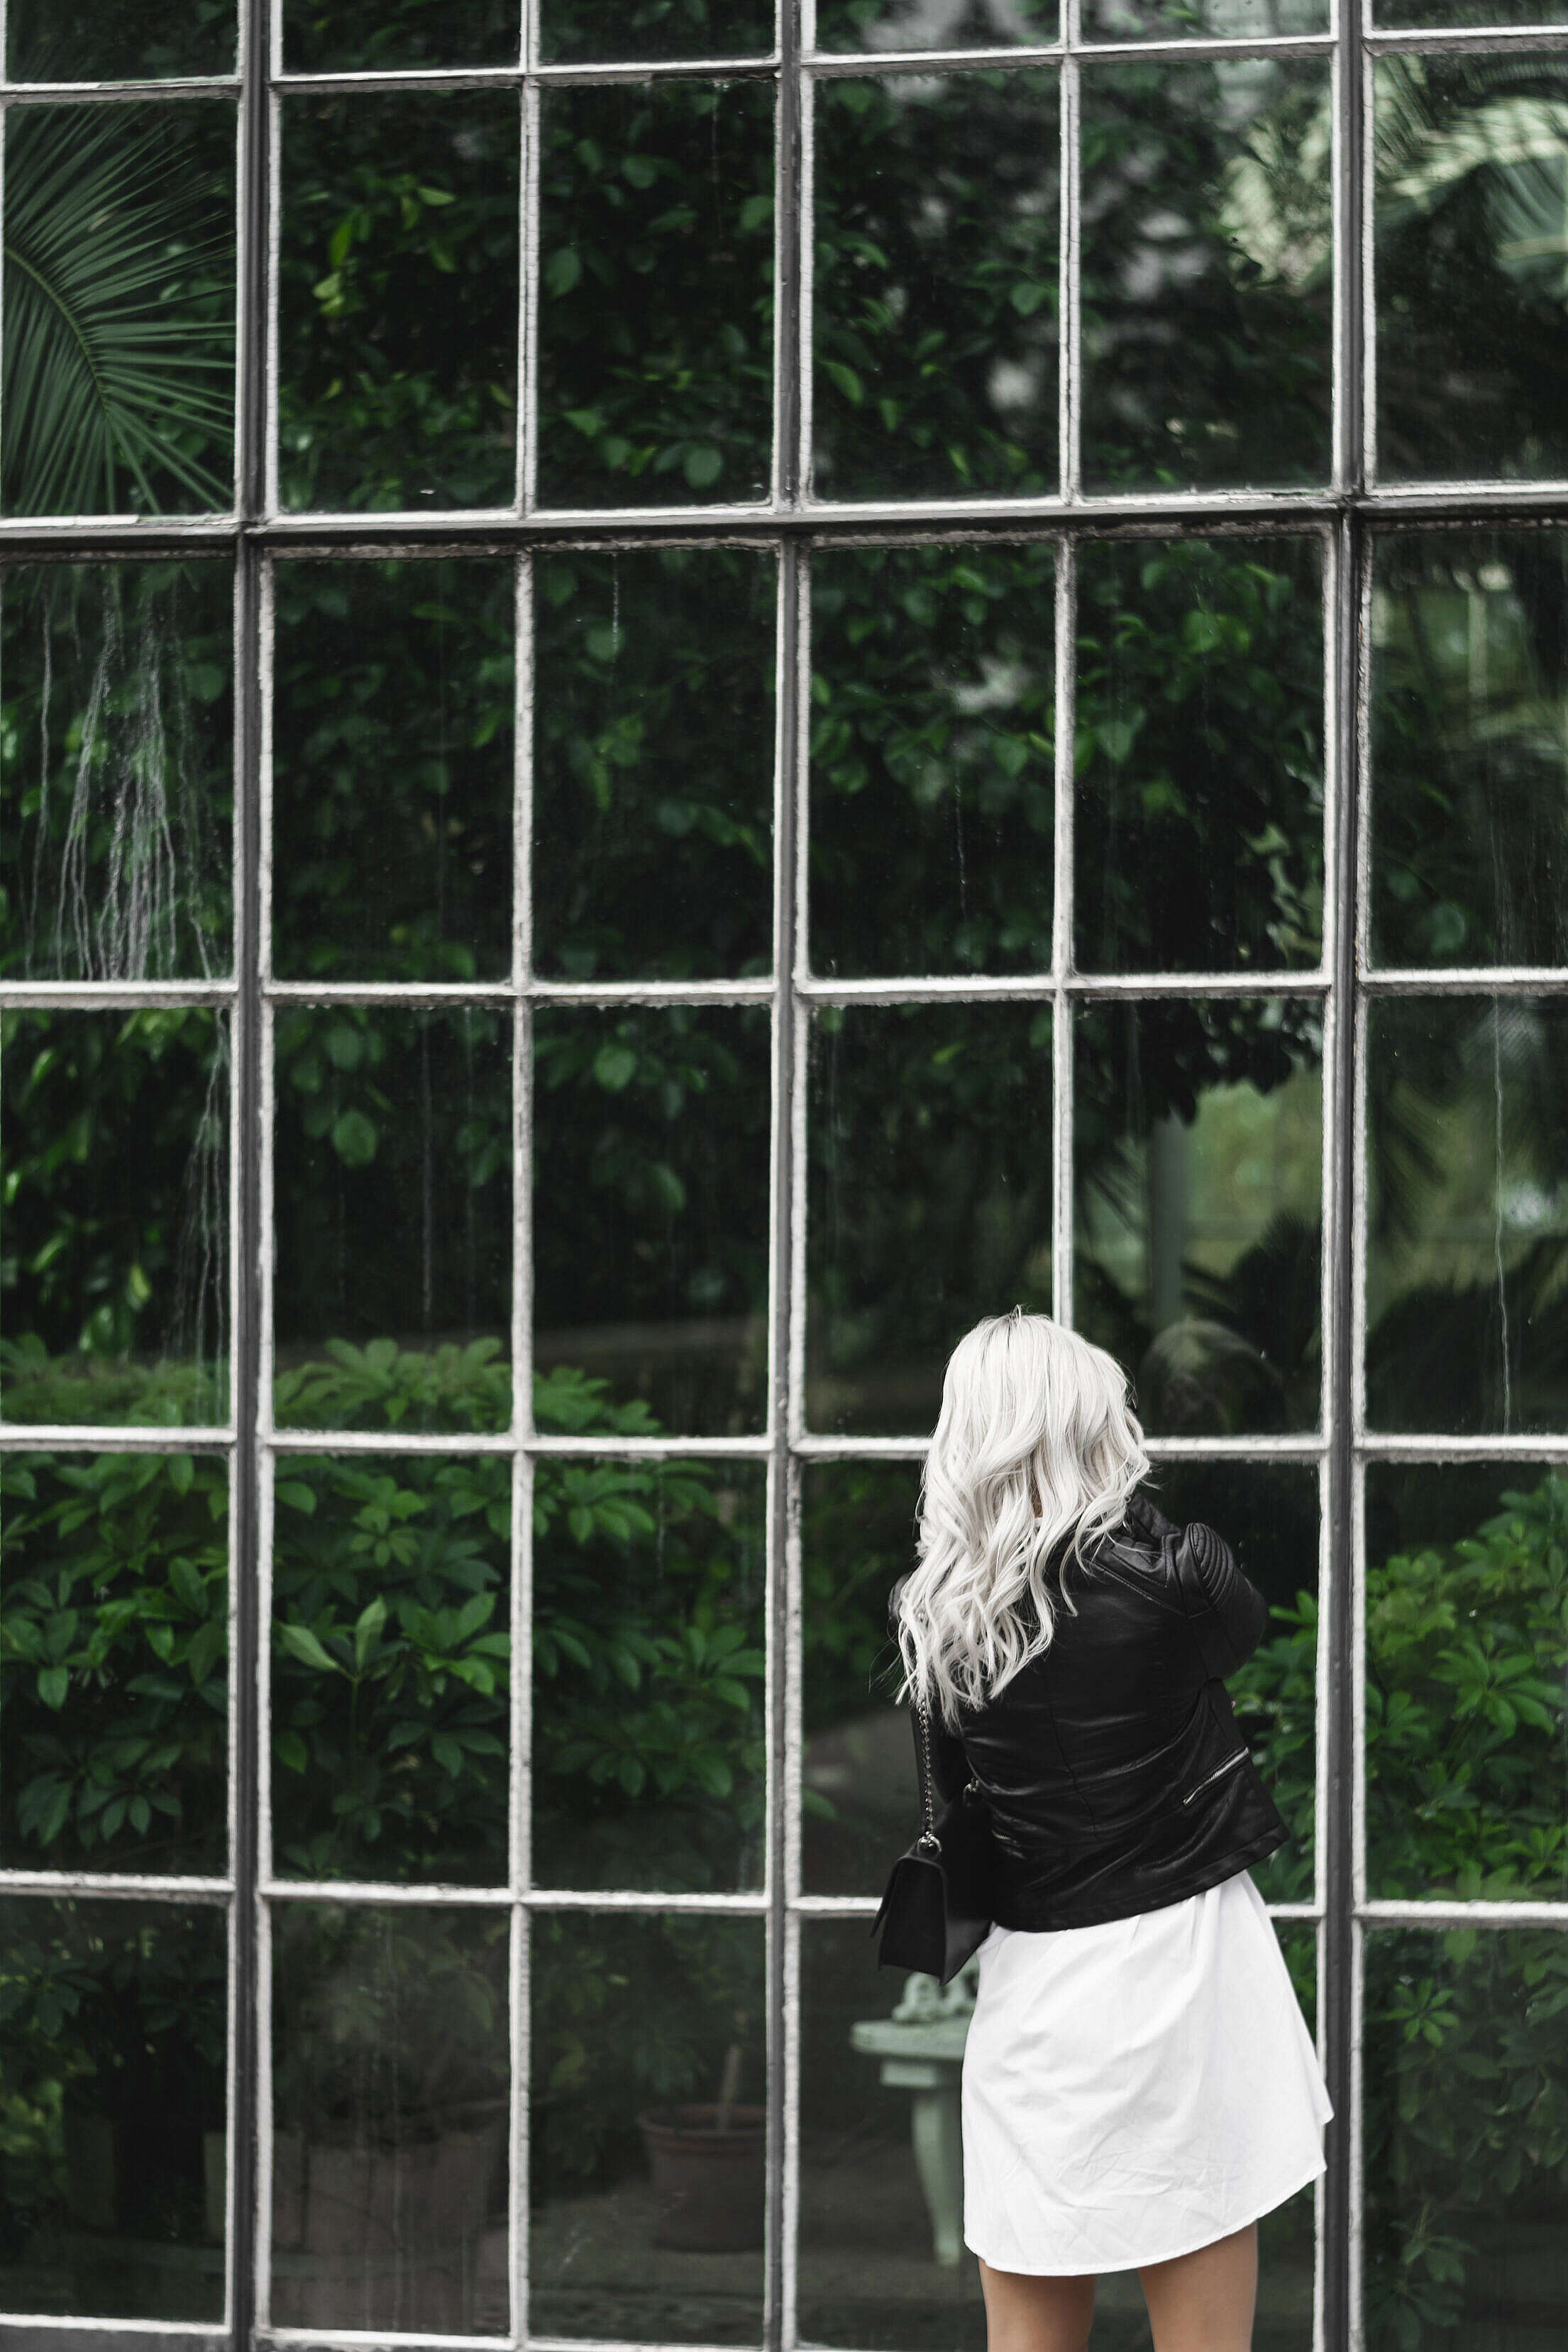 Woman Looking Through Old Windows of The Botanical Garden Free Stock Photo